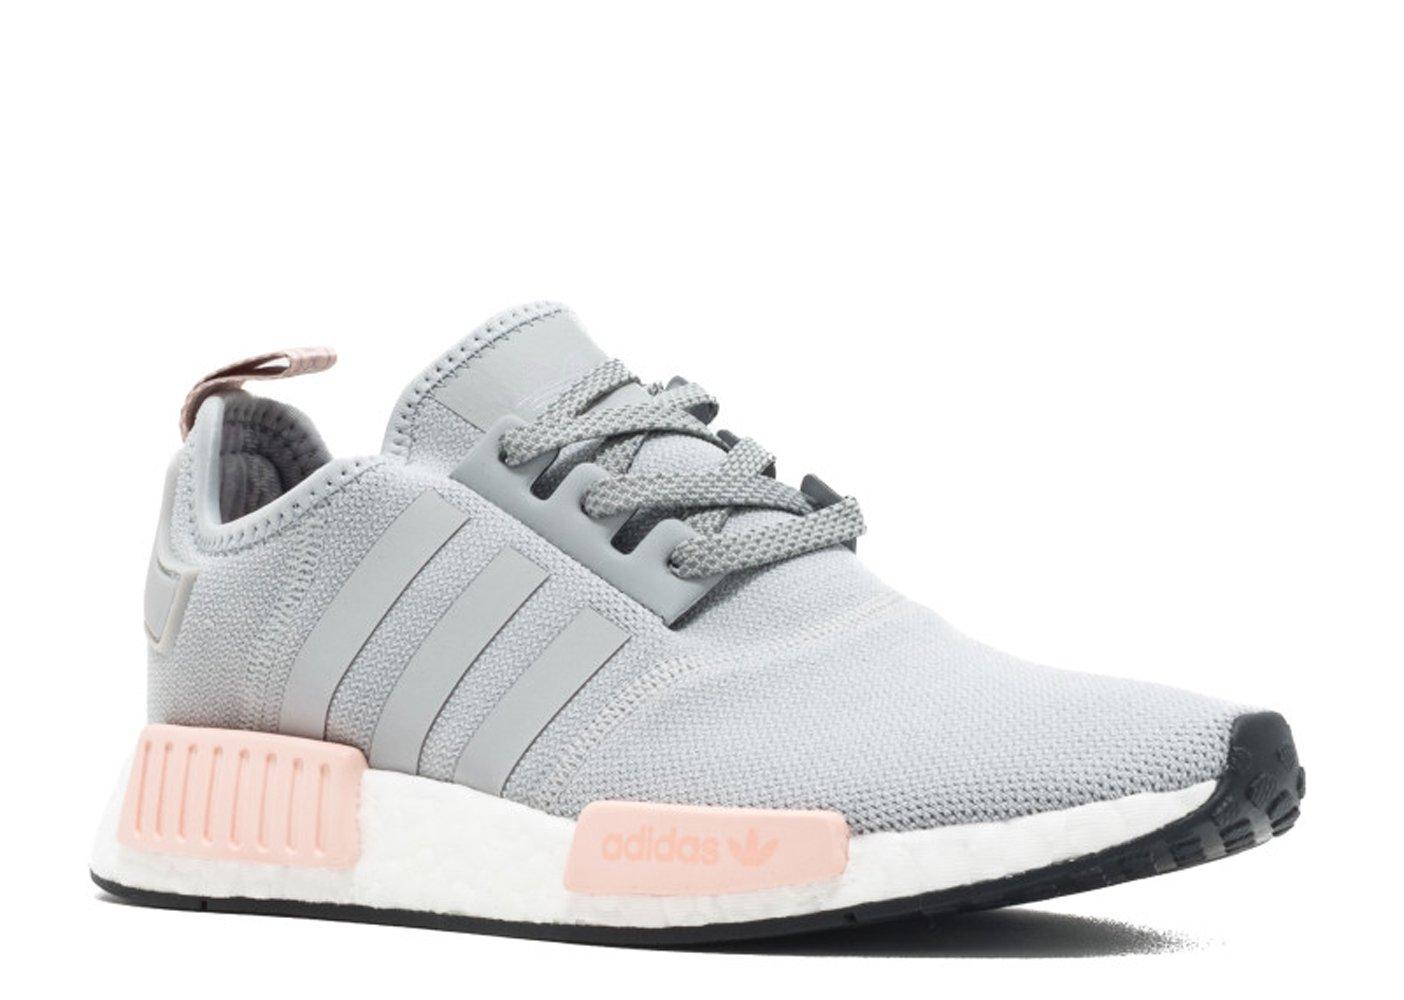 2d85f72df7ba7 Fashion nmd r1 raw gray pink women s casual shoes - Thumbnail 1 ...